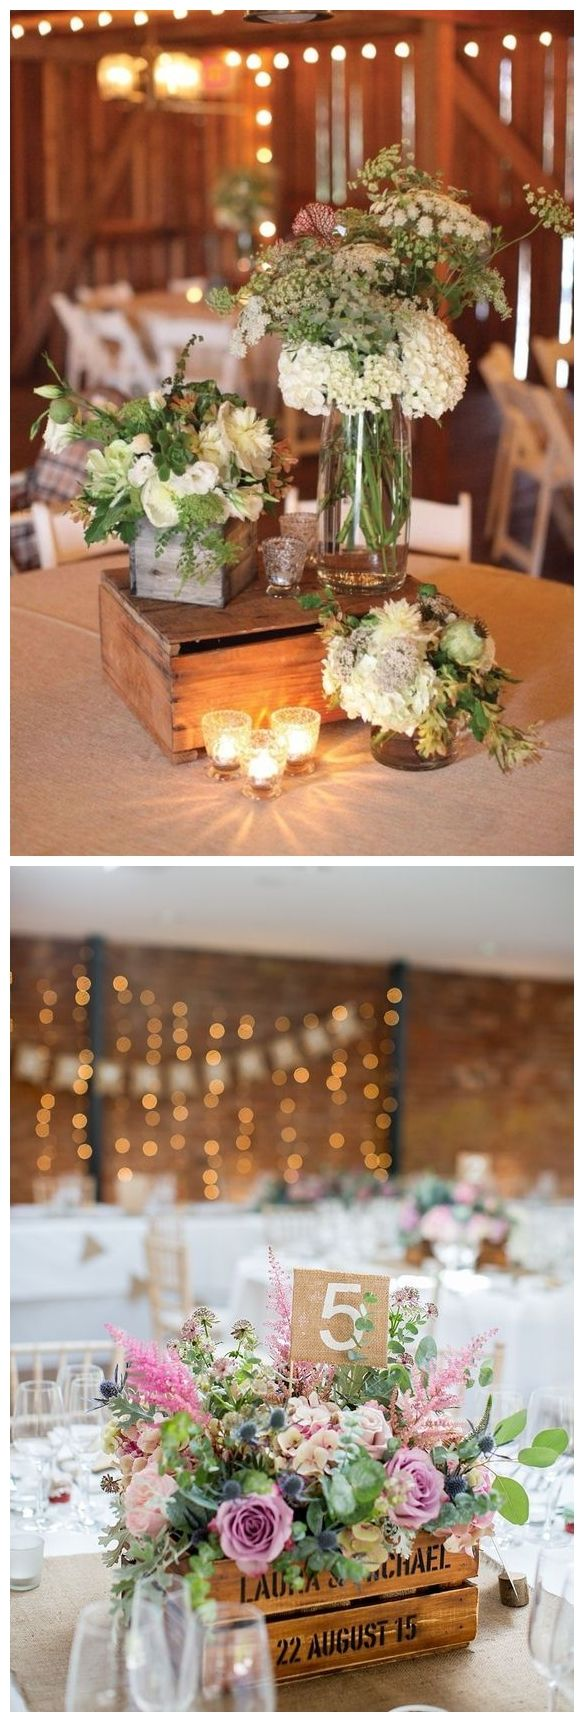 Wedding reception wedding decorations 2018 november 2018 Rustic Woodsy Wedding Trend  Wooden Crates  Wedding